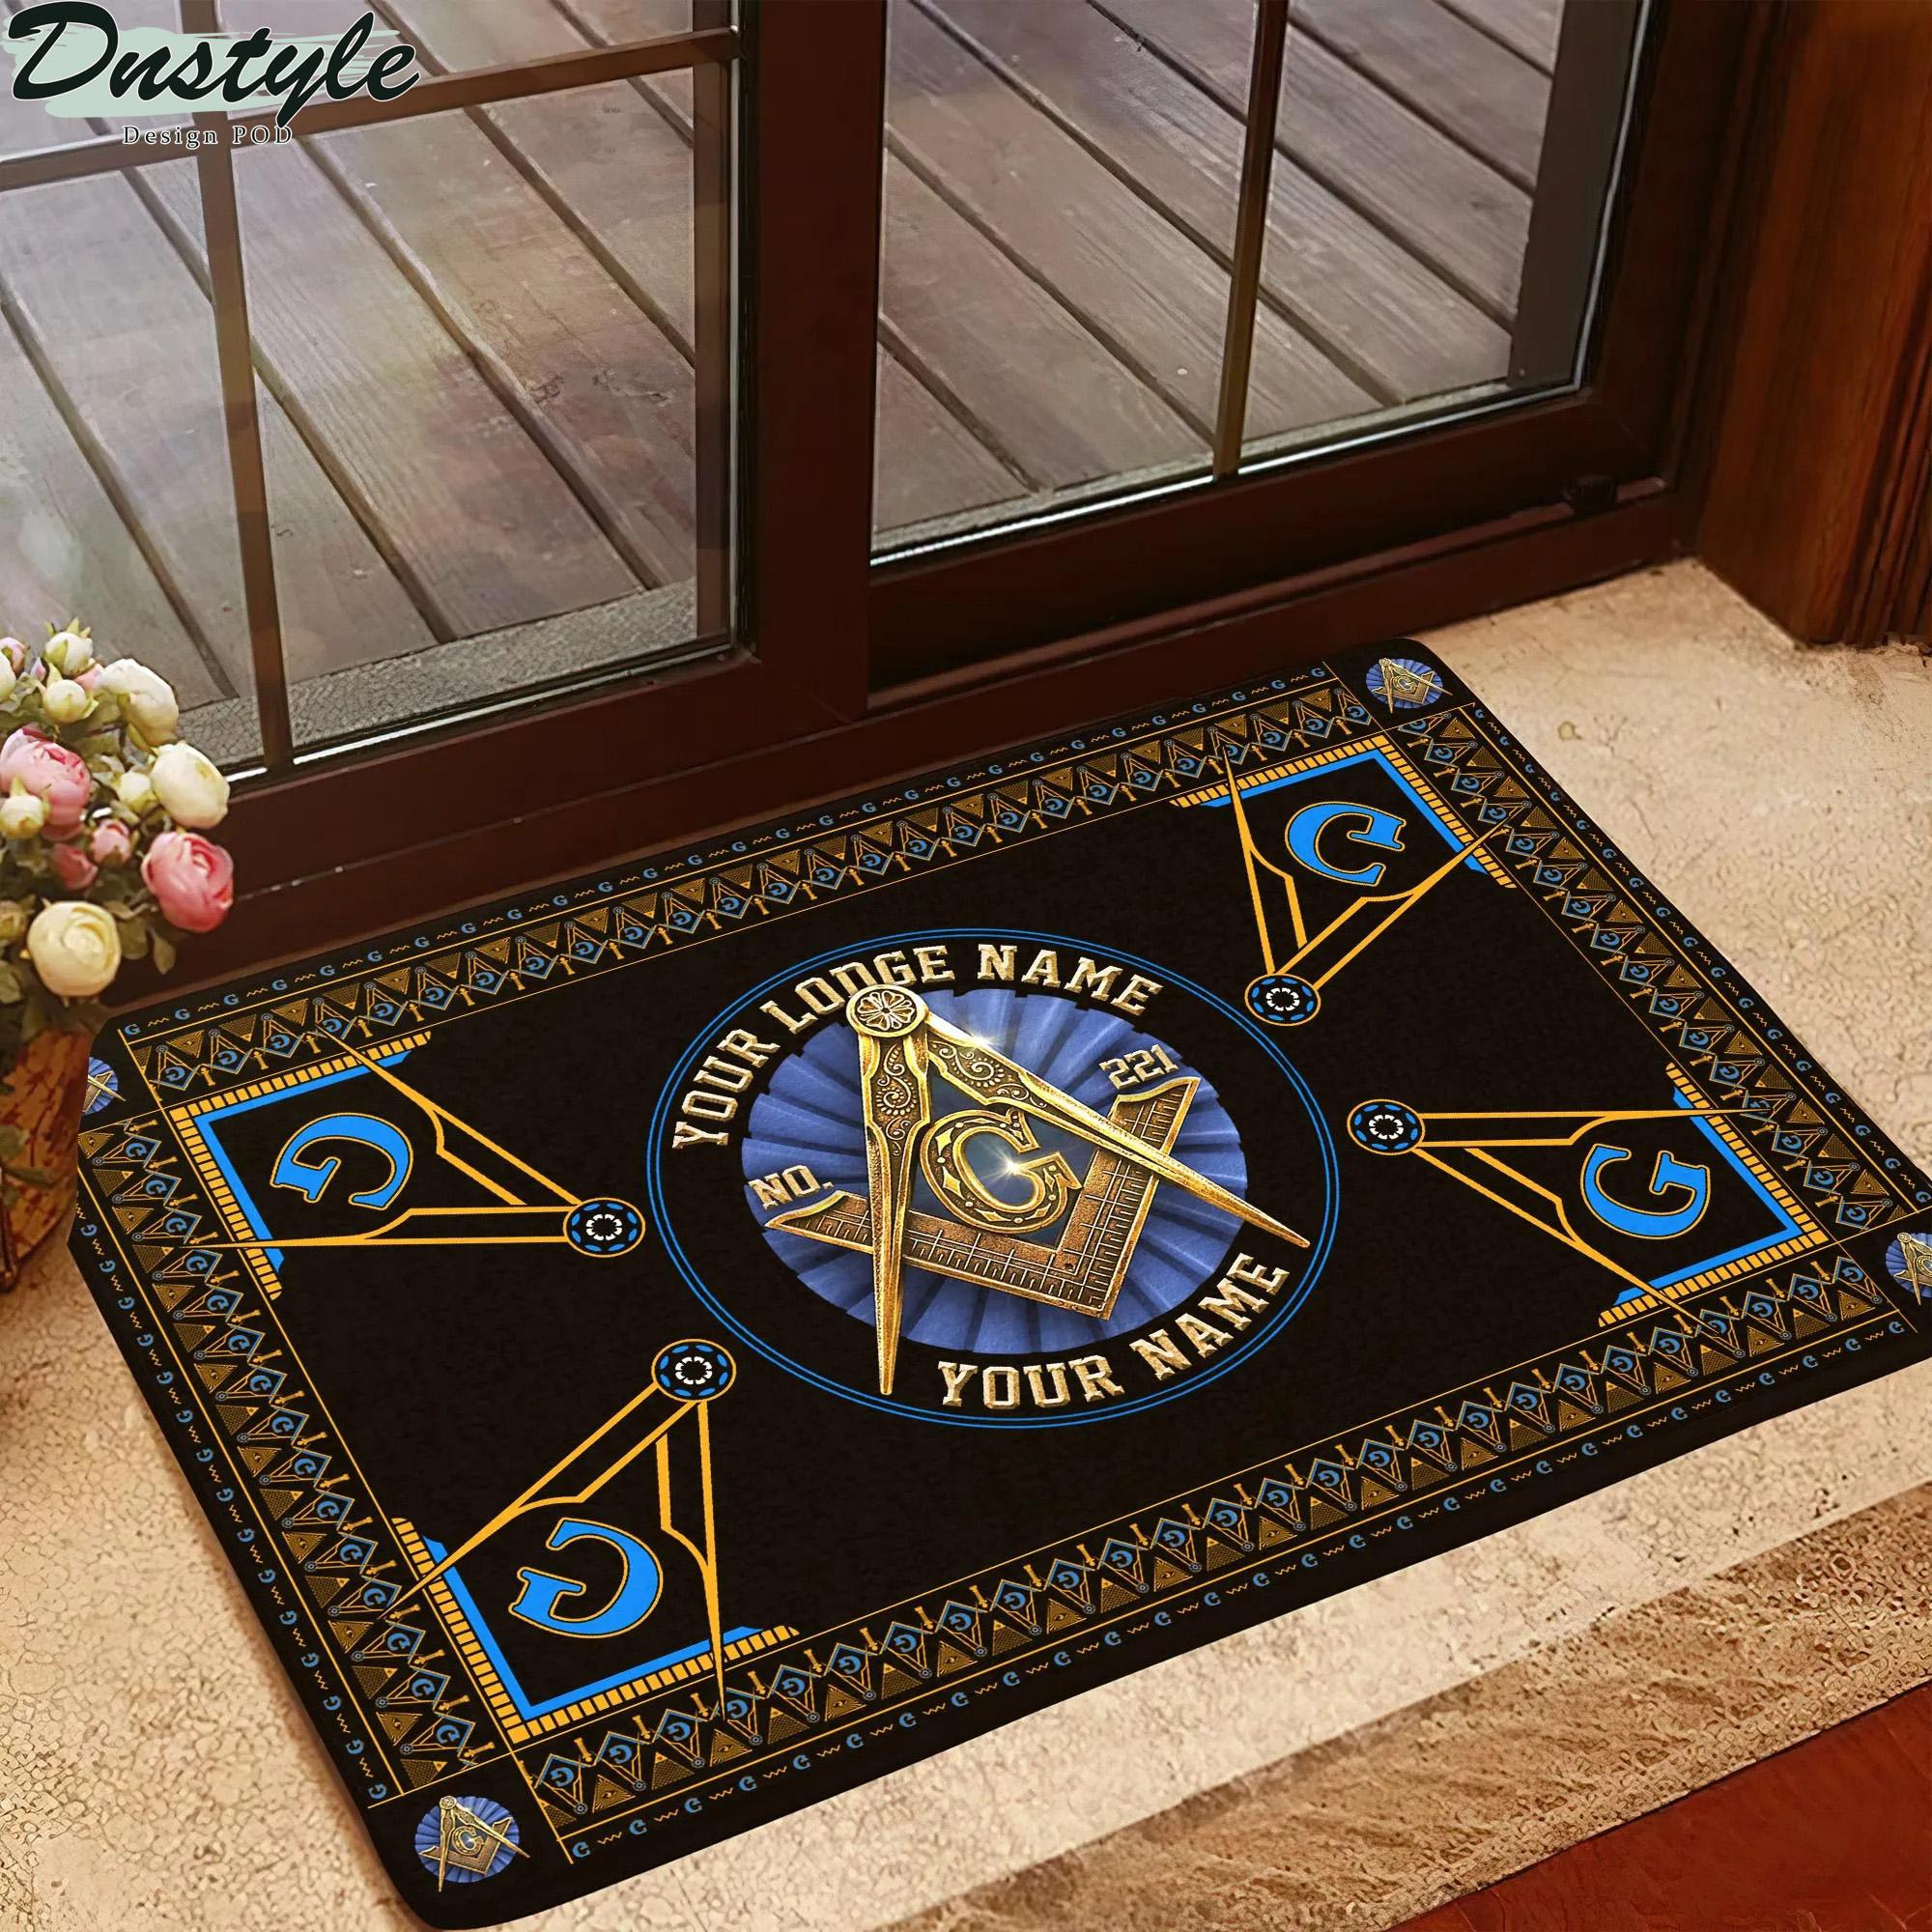 Freemasonry masonic custom lodge name number doormat